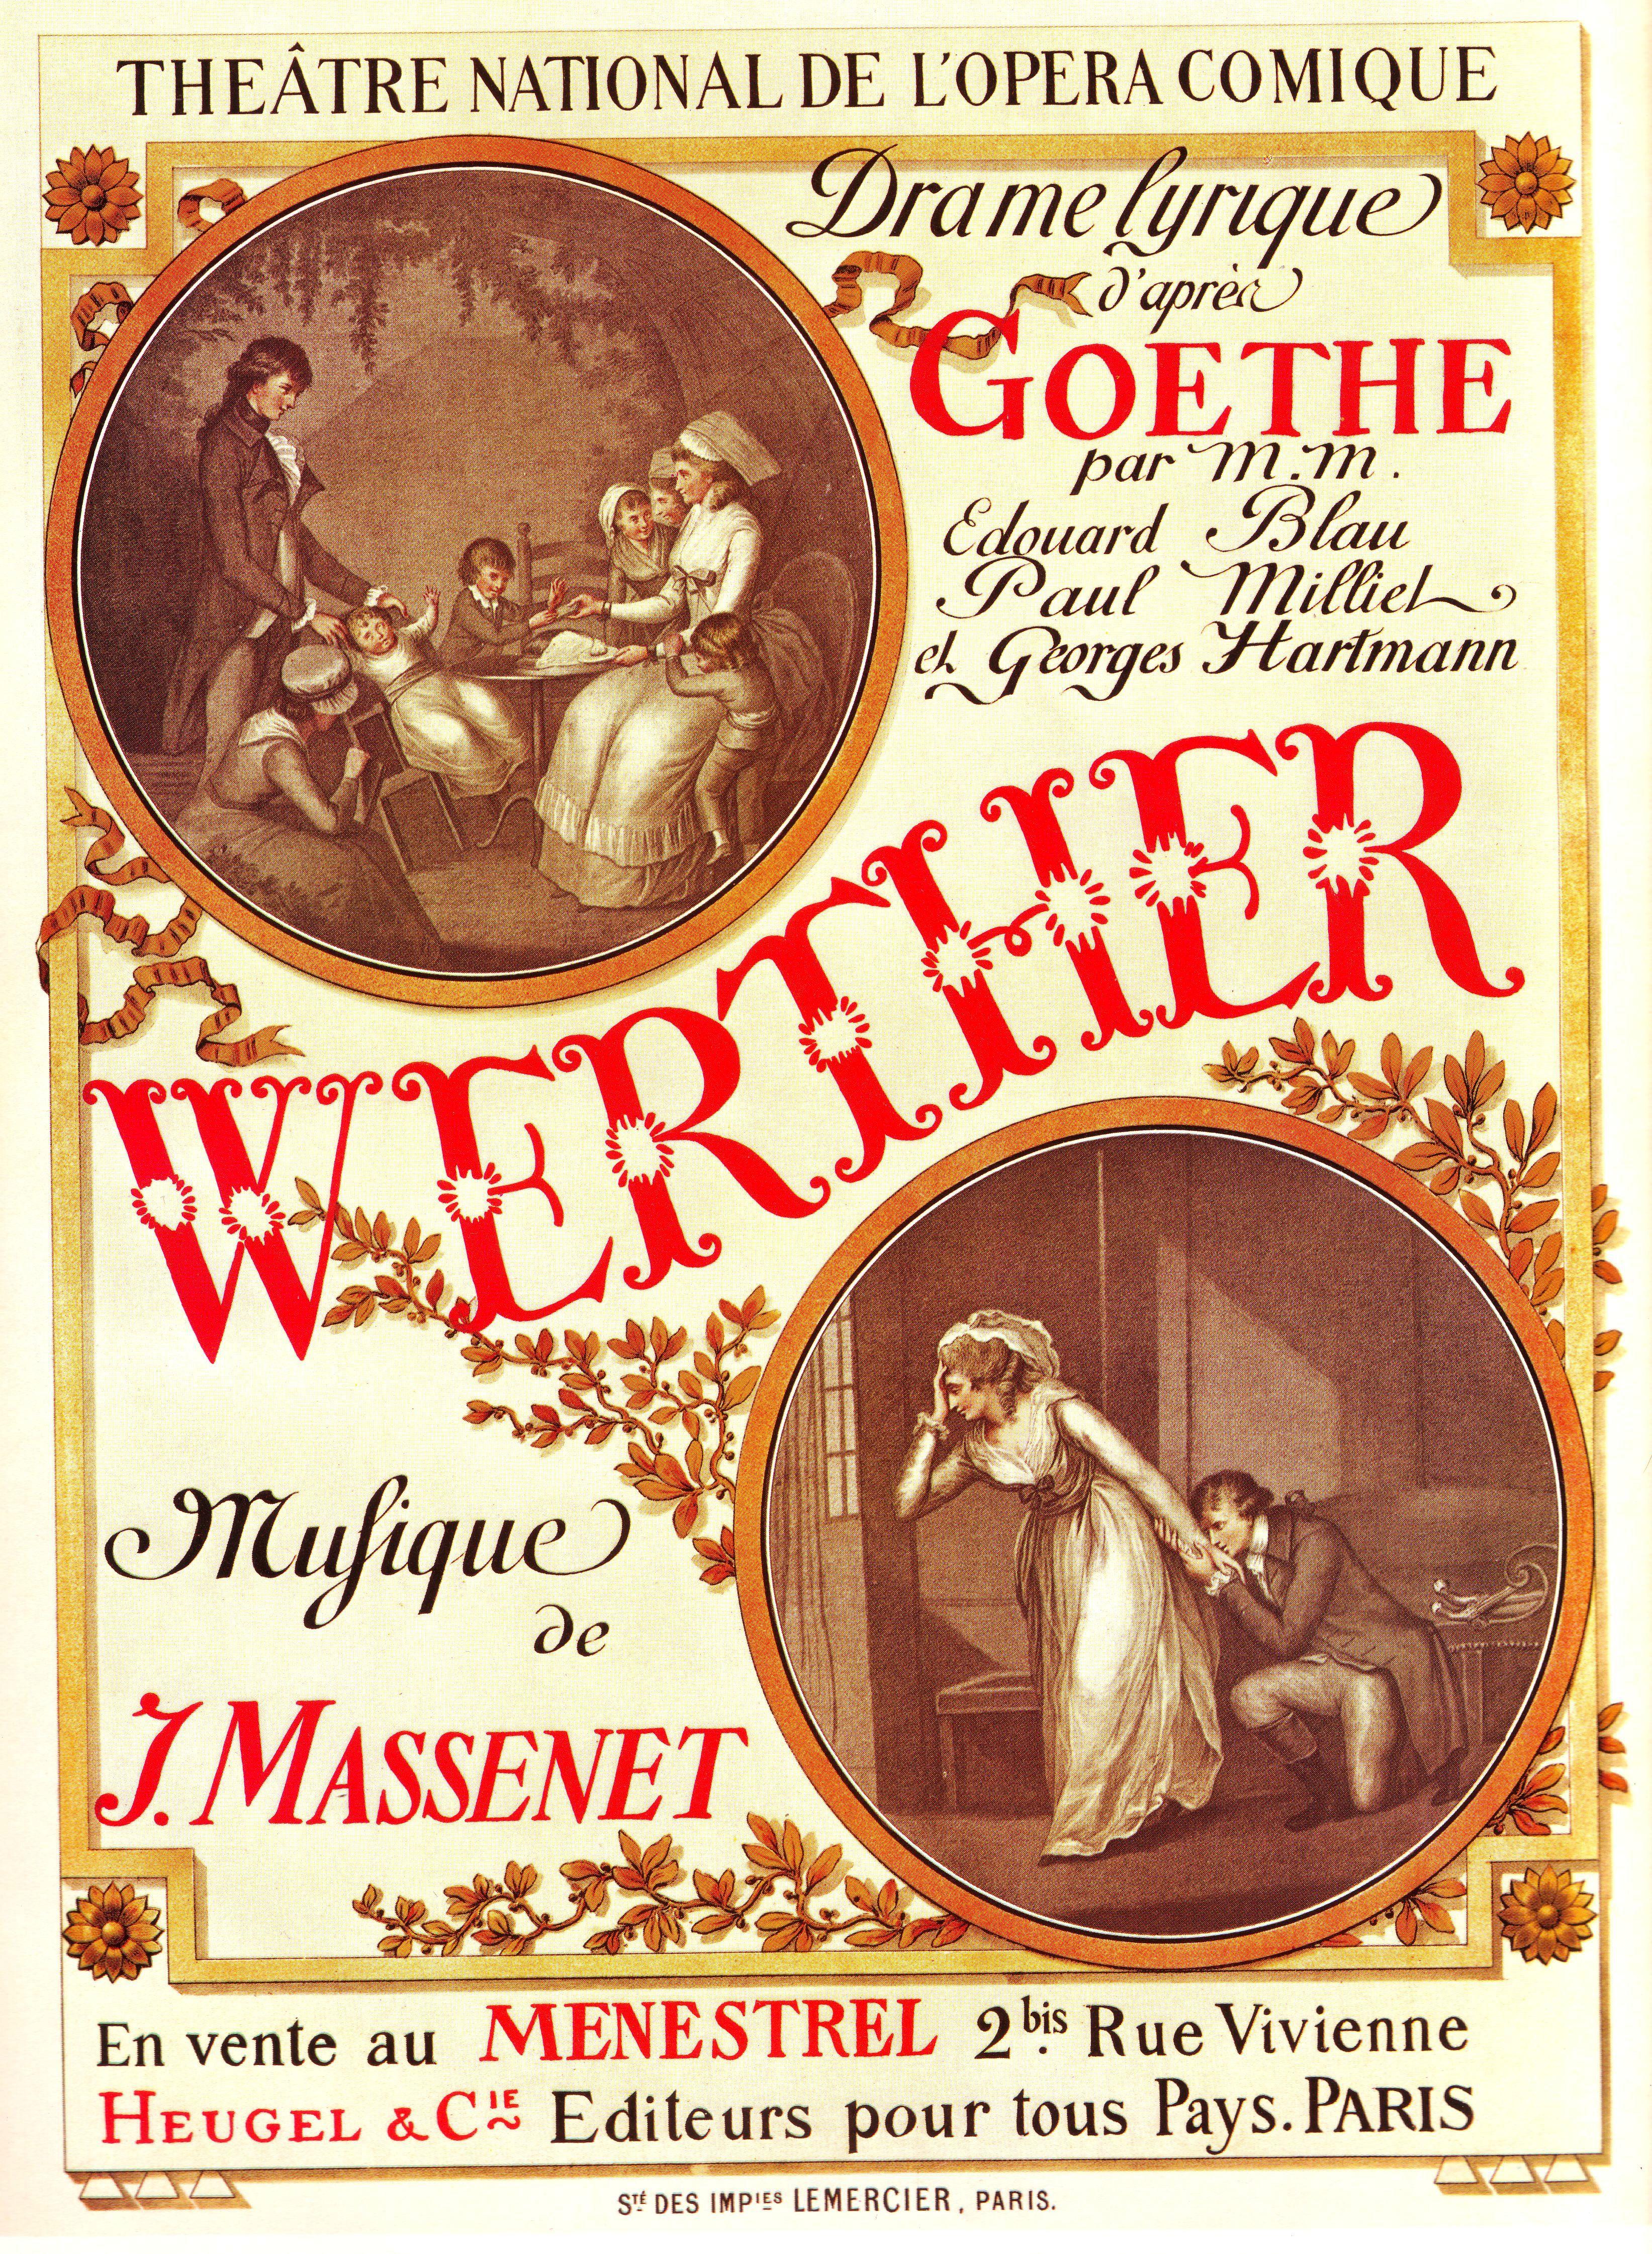 400X300MM Original-Antique-French-Advertising-Poster-1893-Paris-Opera-Goethe-Werther jumbo imán de nevera SFM-0550